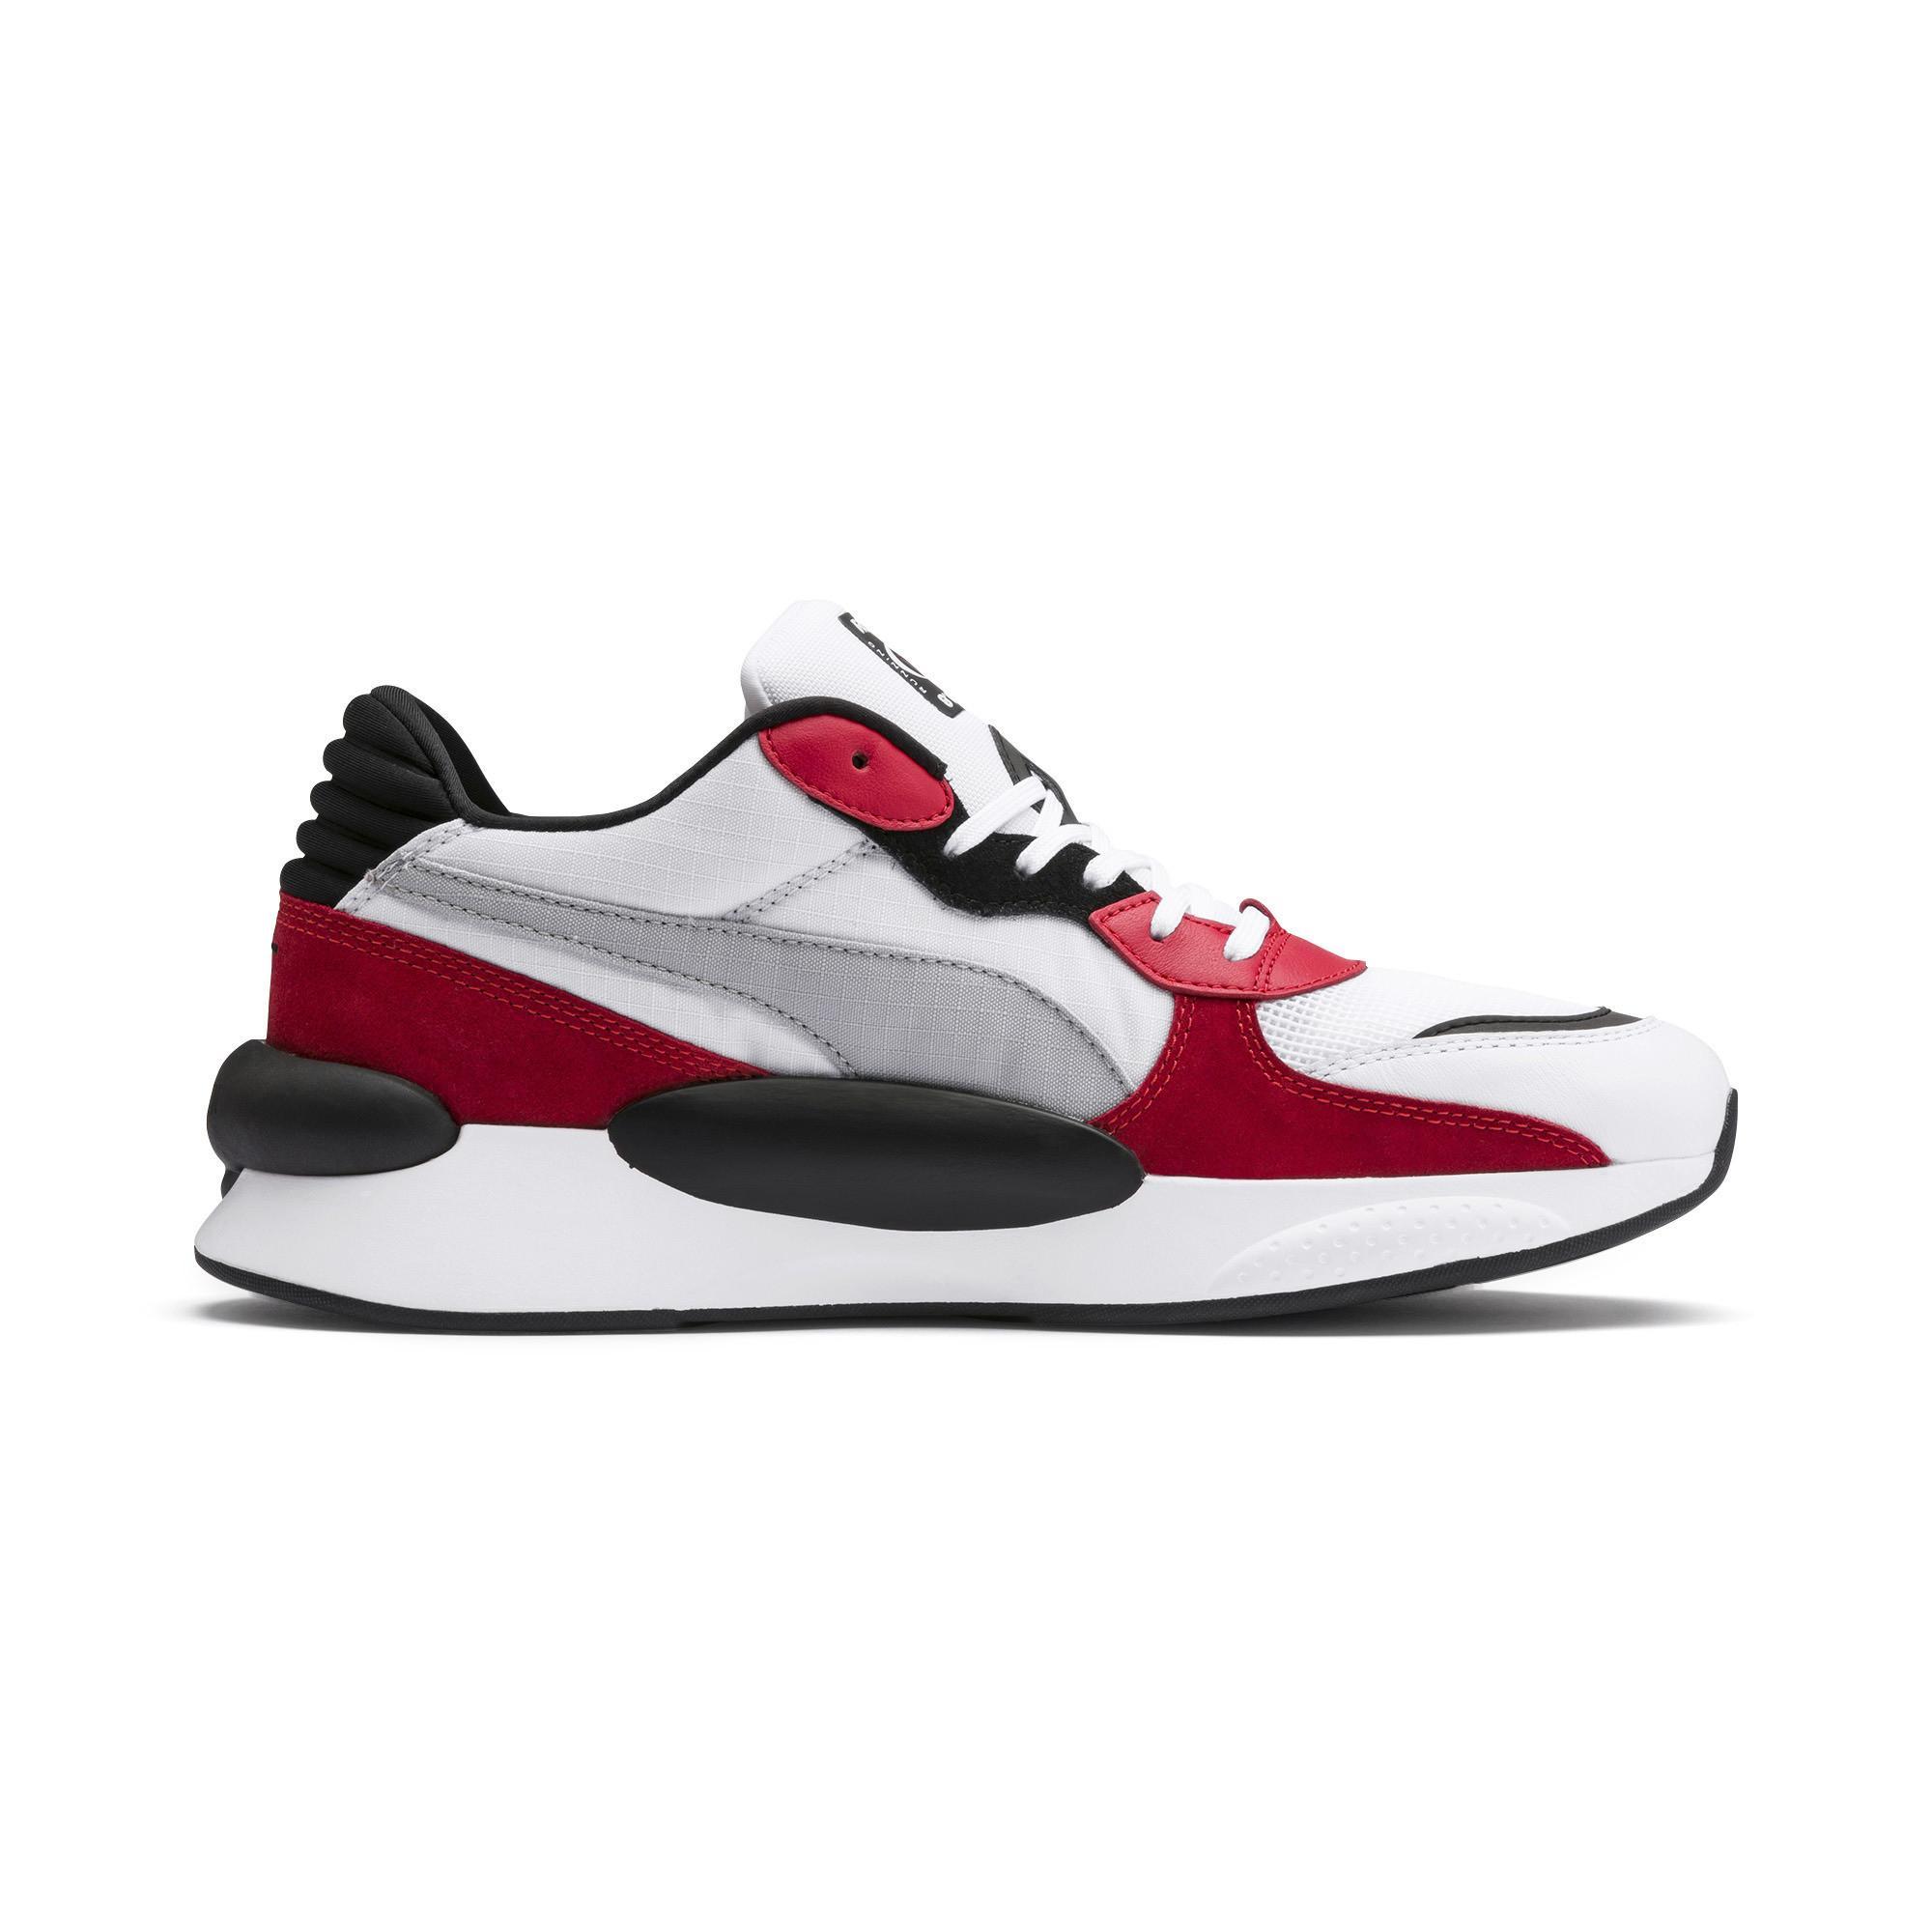 Puma Shoes Rs 9.8 Space